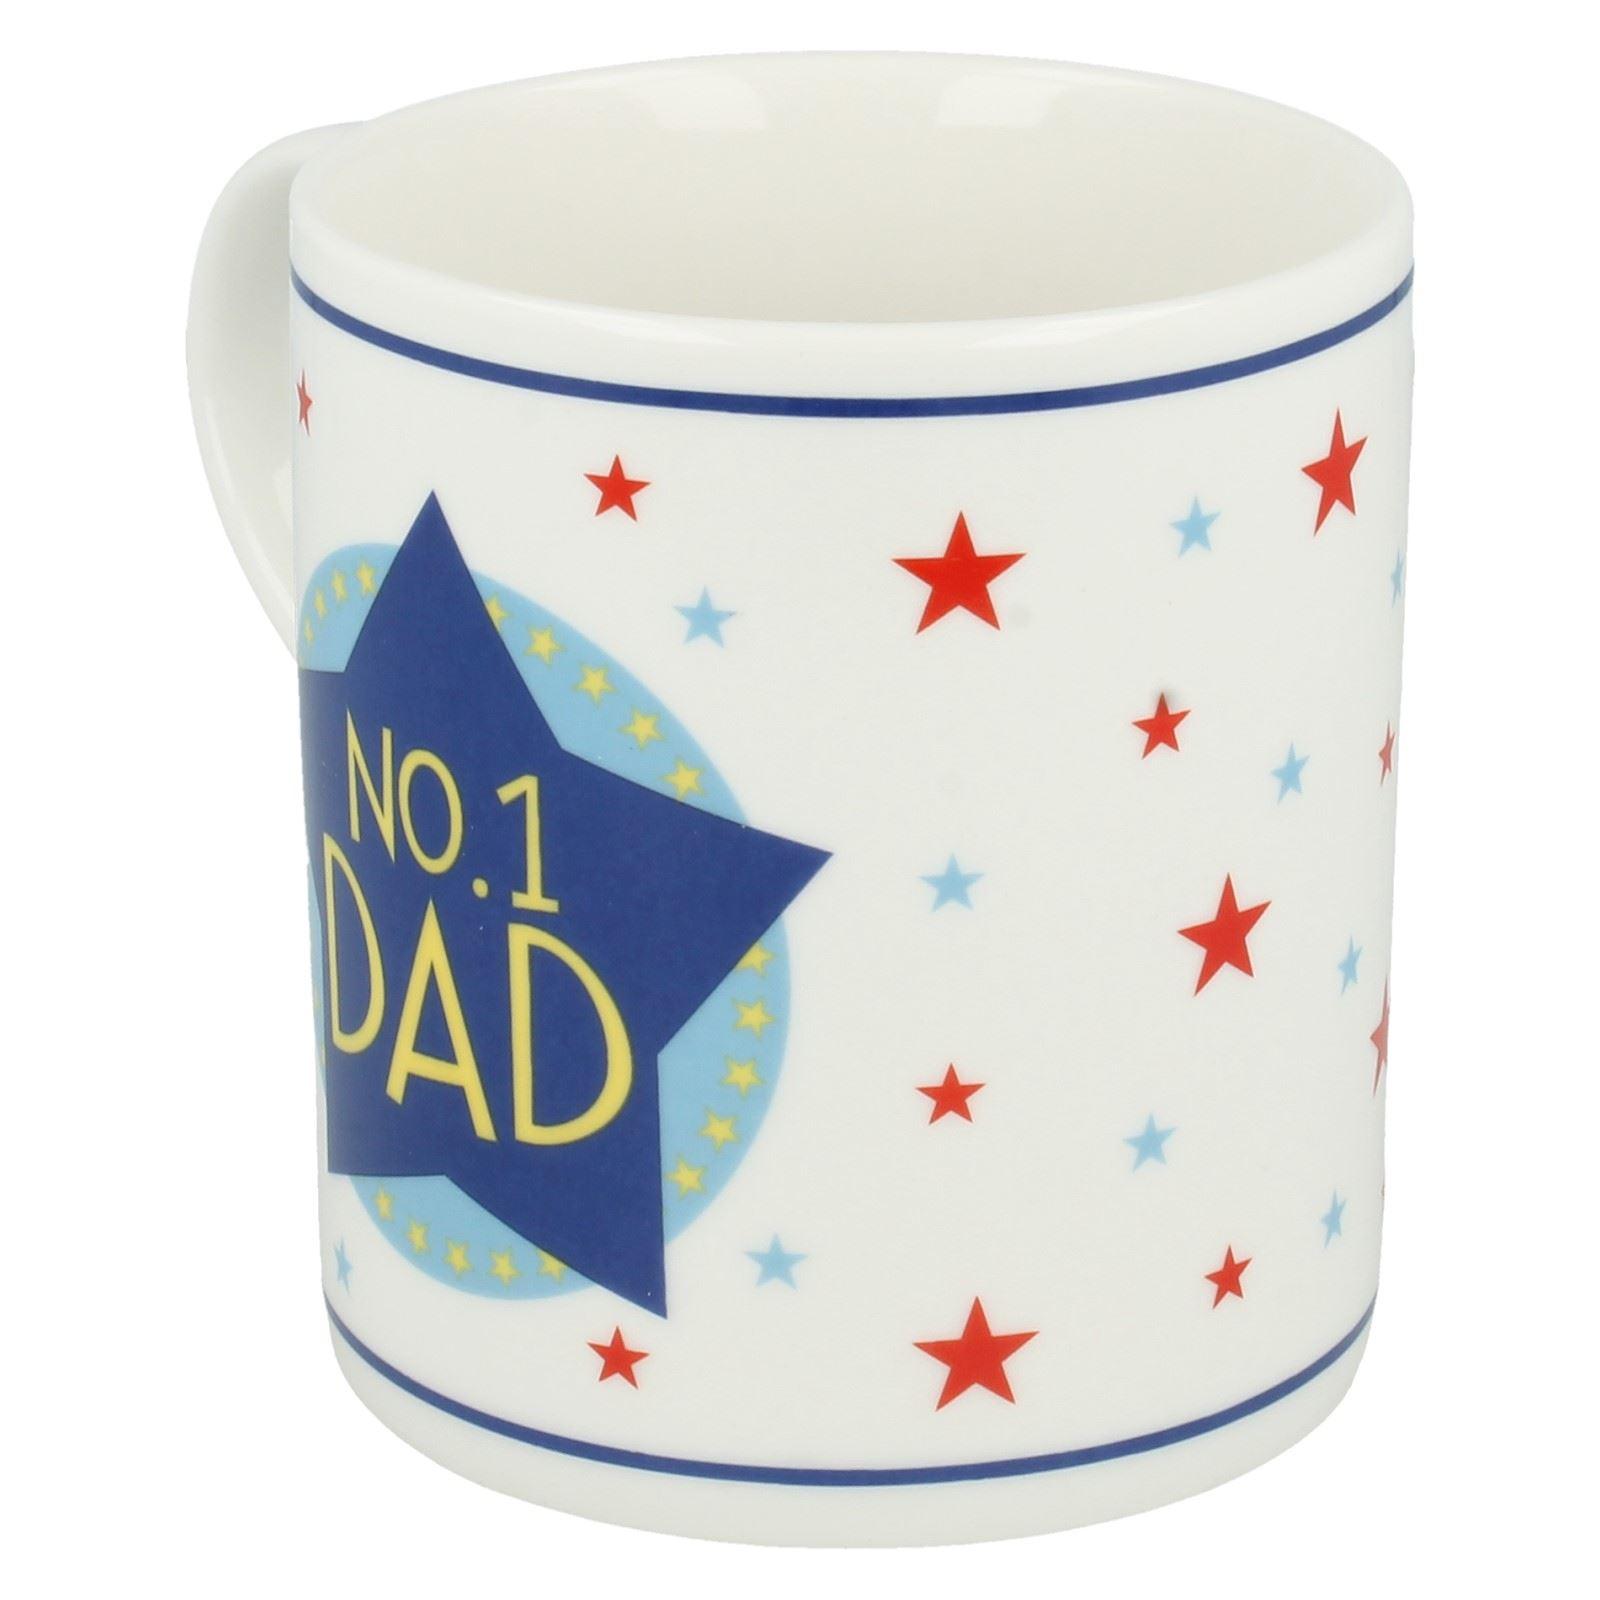 The-Leonardo-Collection-No-1-Dad-Mug-LP33551